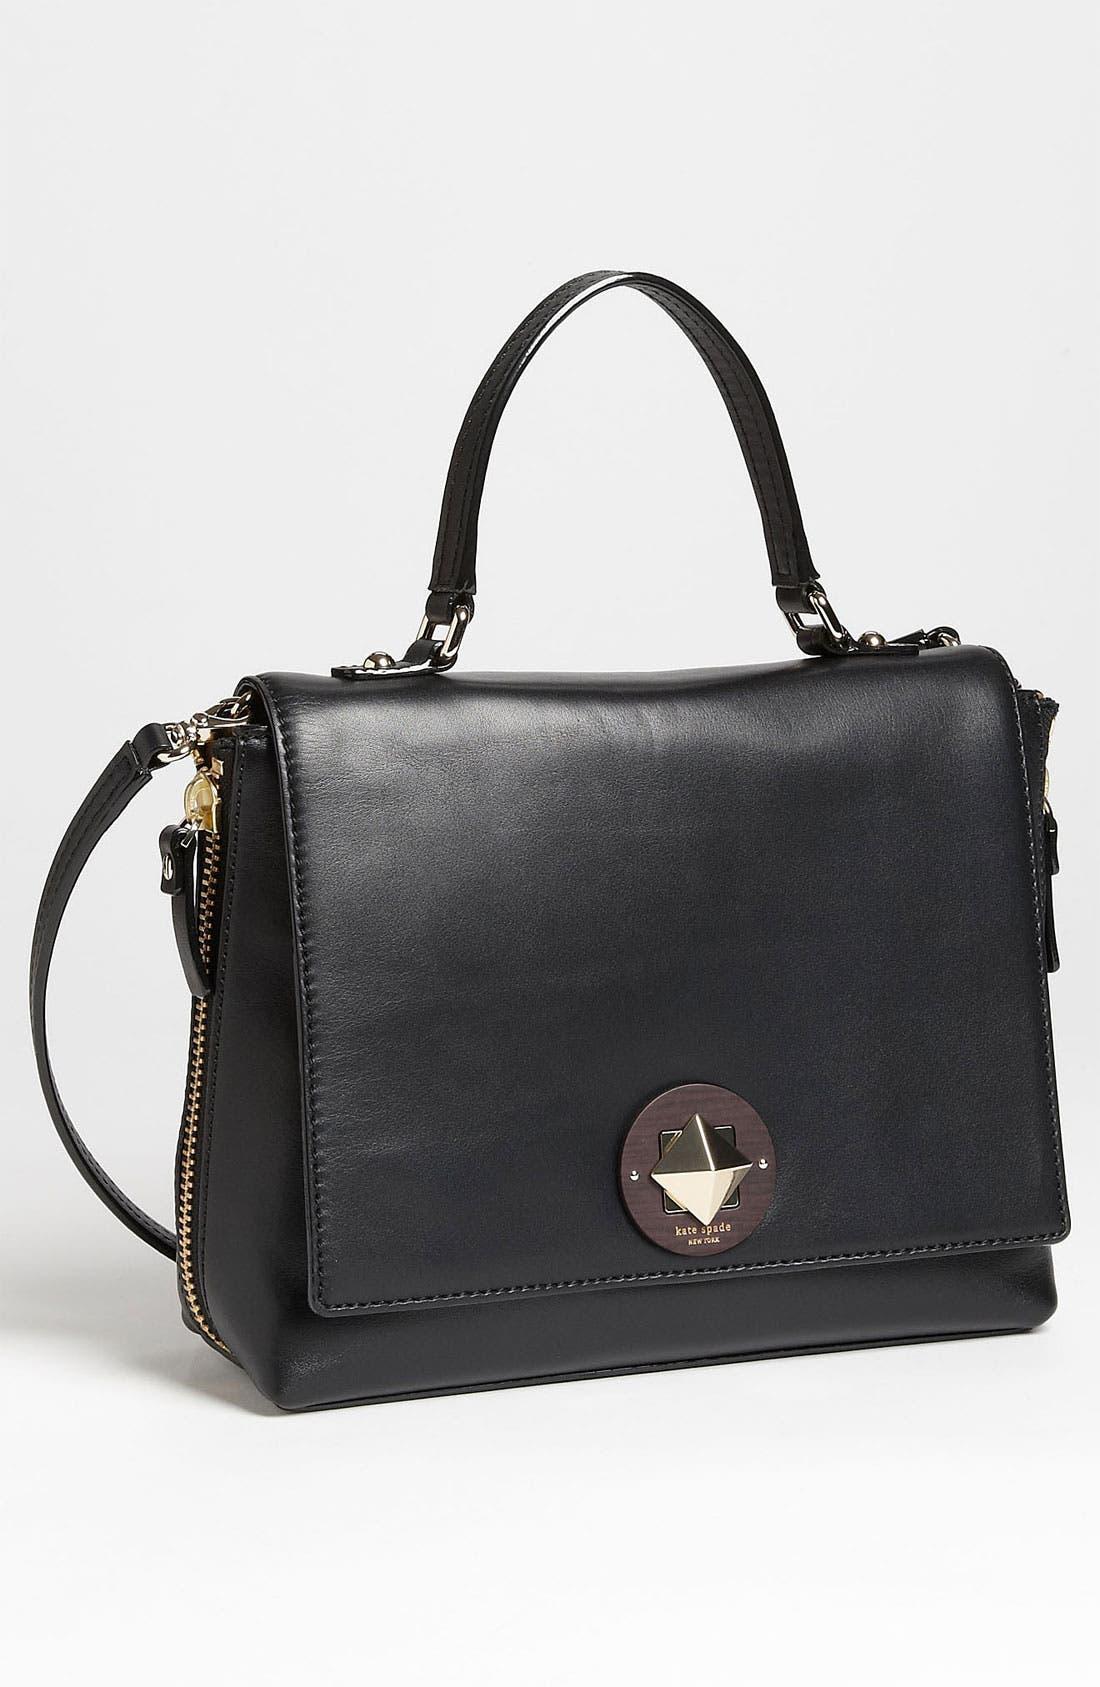 Main Image - kate spade new york 'varick street - abbie' satchel